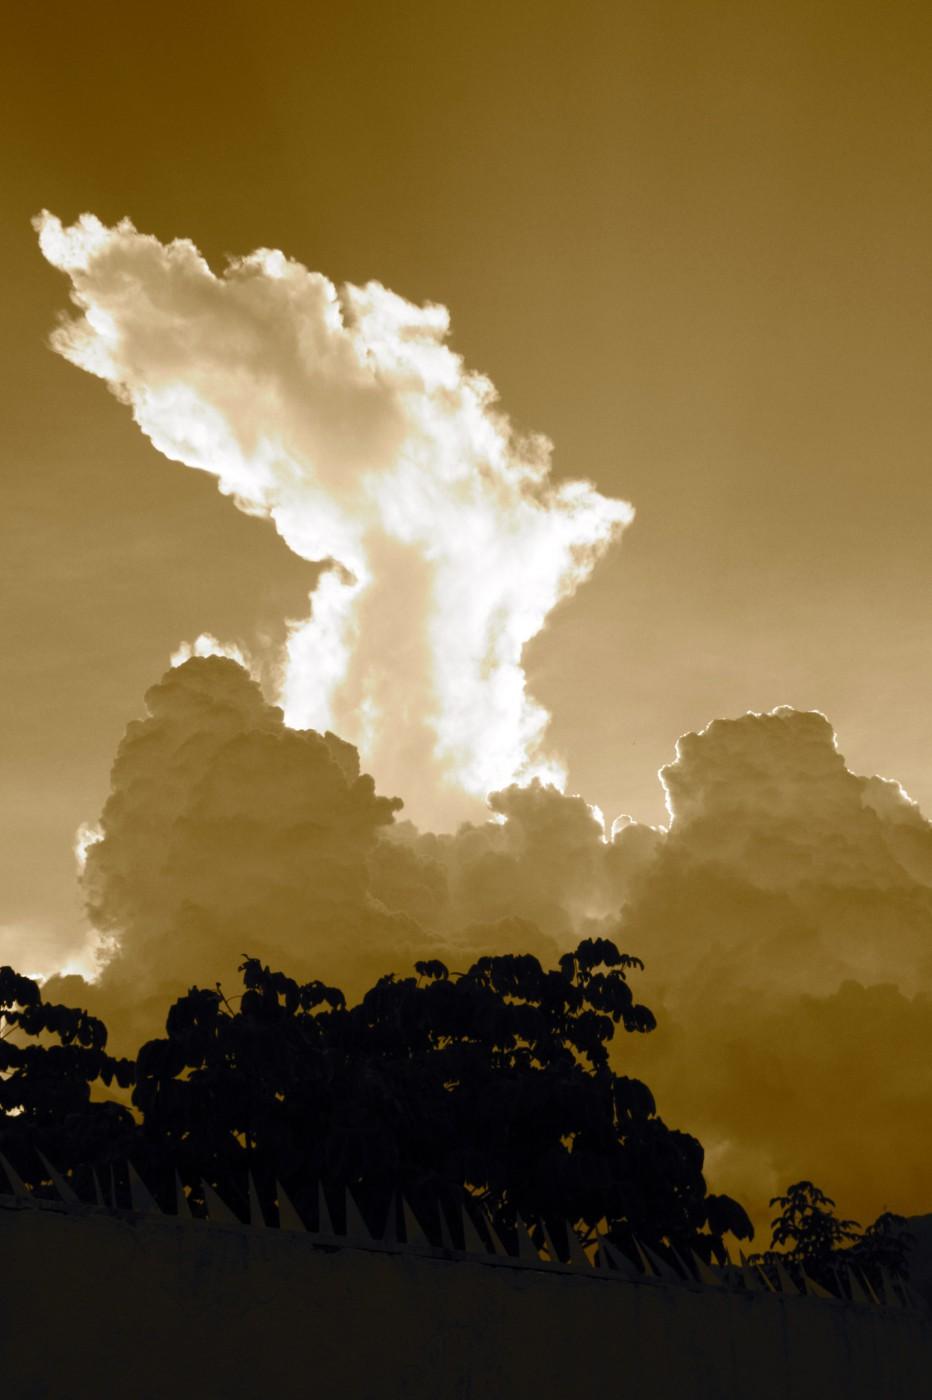 Domenick Petrungaro, </span><span><em>The Sheltering Sky</em>, </span><span>2012